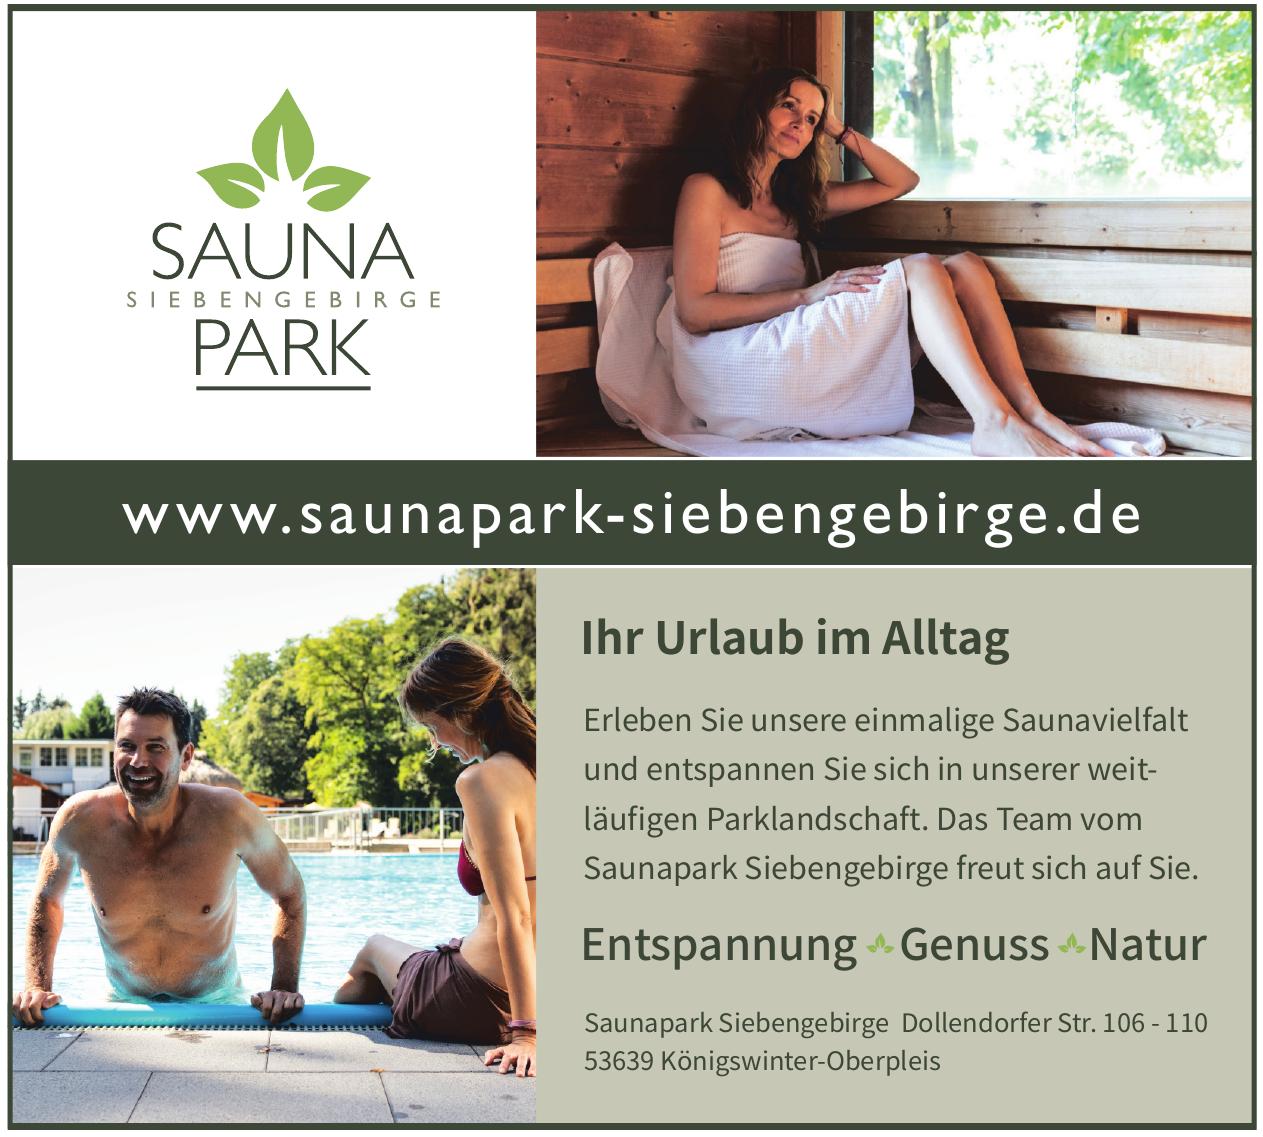 Saunapark Siebengebirge